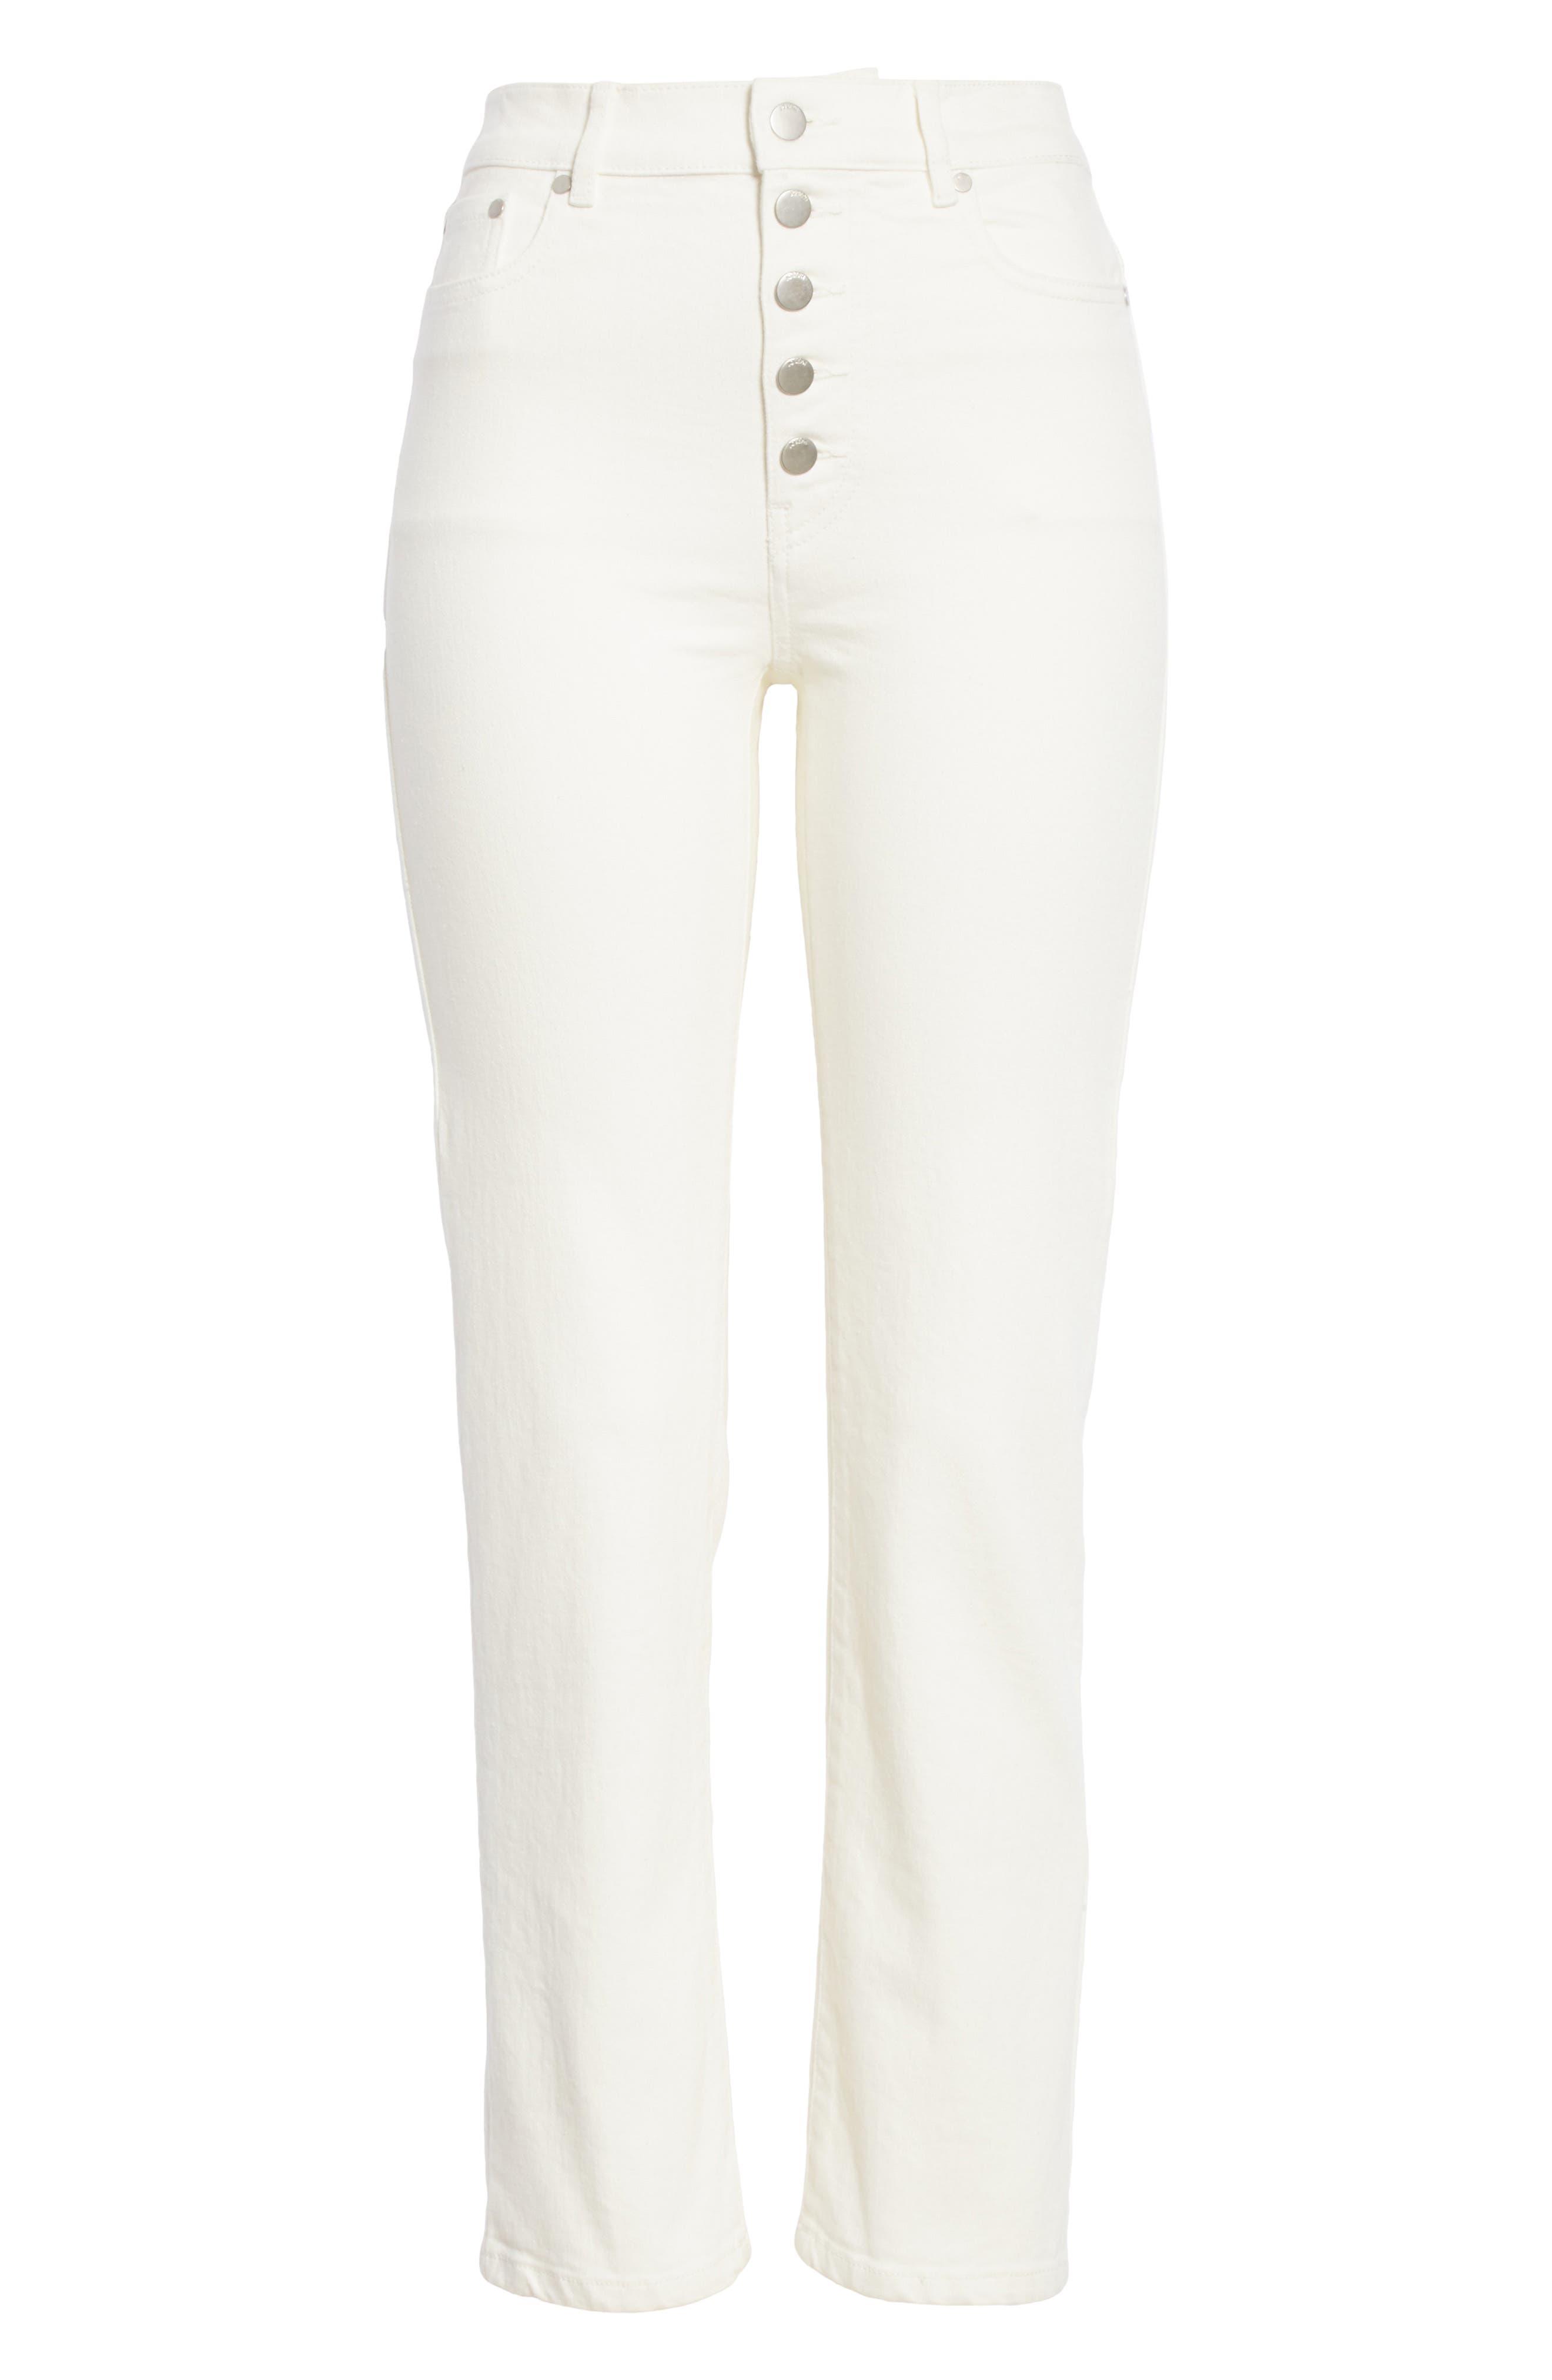 White Denim Jeans,                             Alternate thumbnail 6, color,                             100